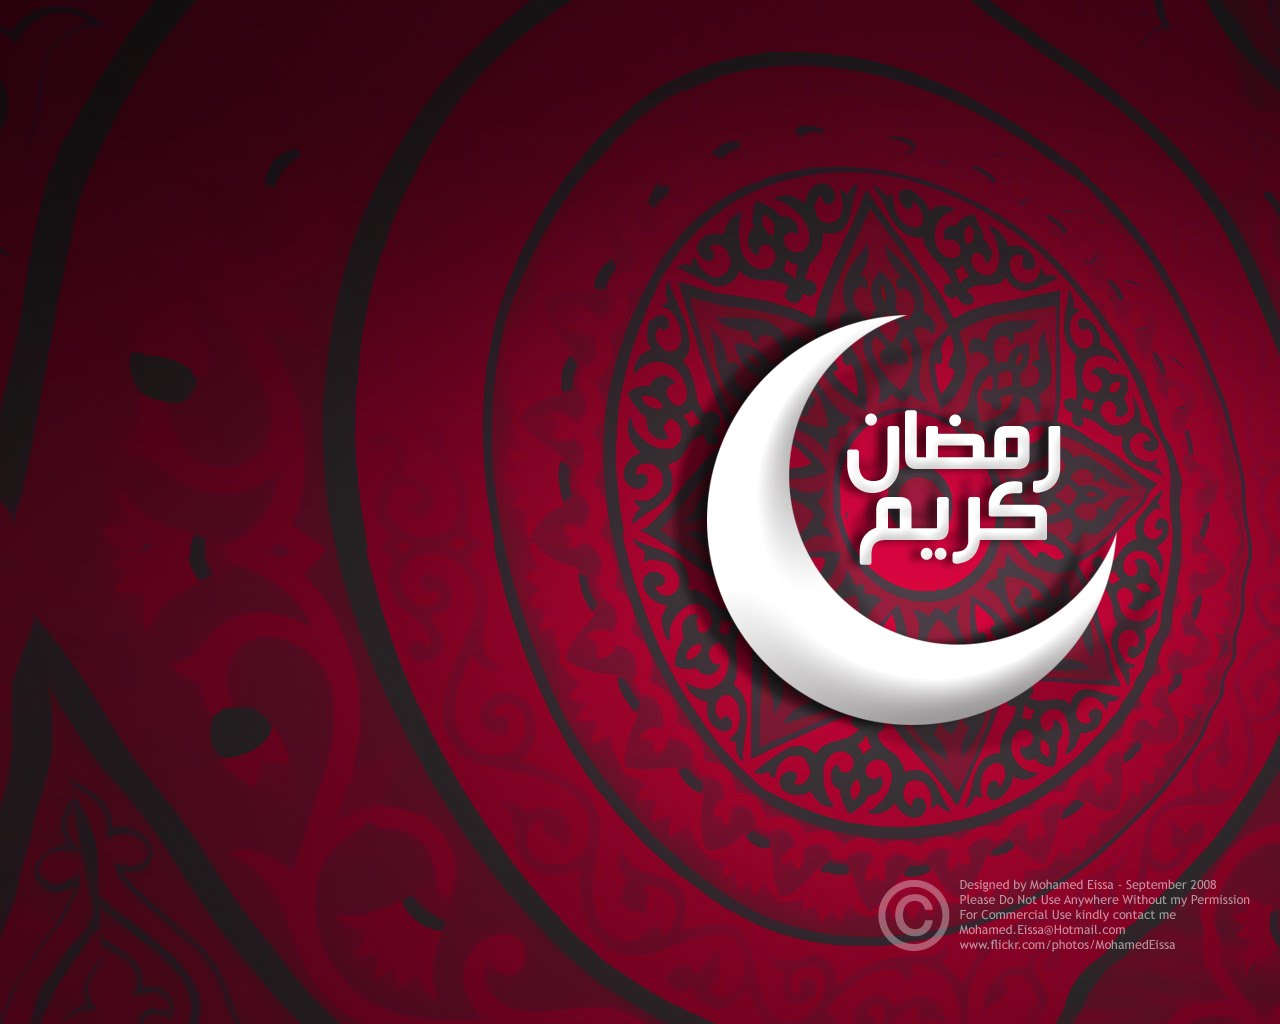 http://2.bp.blogspot.com/-iOV_CFeqgIU/TjJVYsEfZ-I/AAAAAAAABaw/oeZCkDwq4VI/s1600/Ramadan_Wallpaper_2008_by_MohamedEissa.jpg